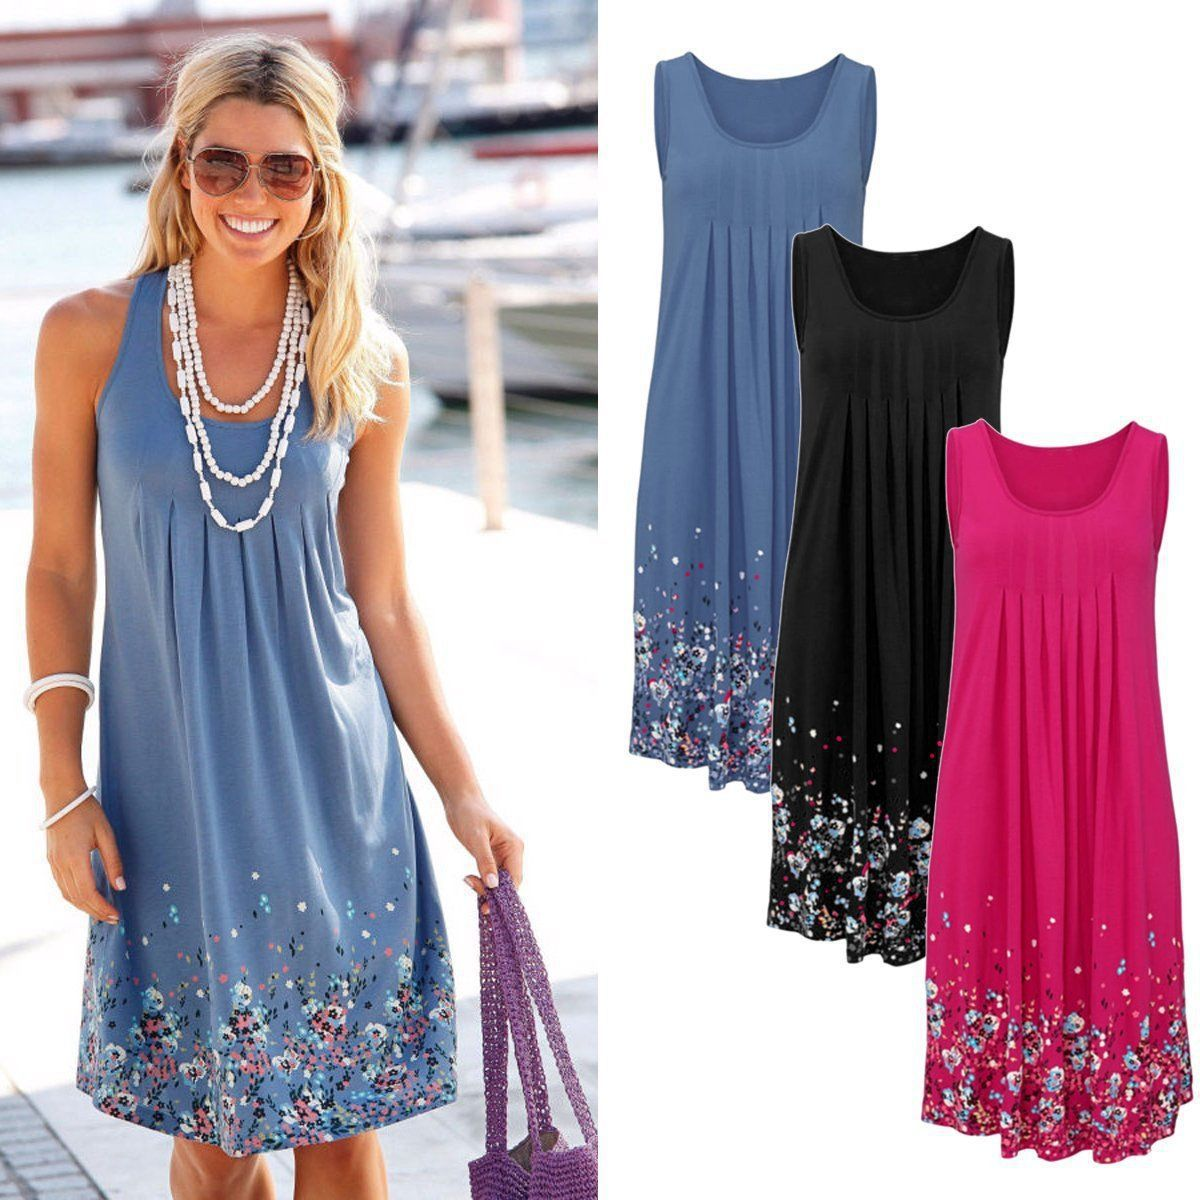 c56a66a5bed8 2019 Elegant Vestidos Floral Print Summer Sundresses Women ...